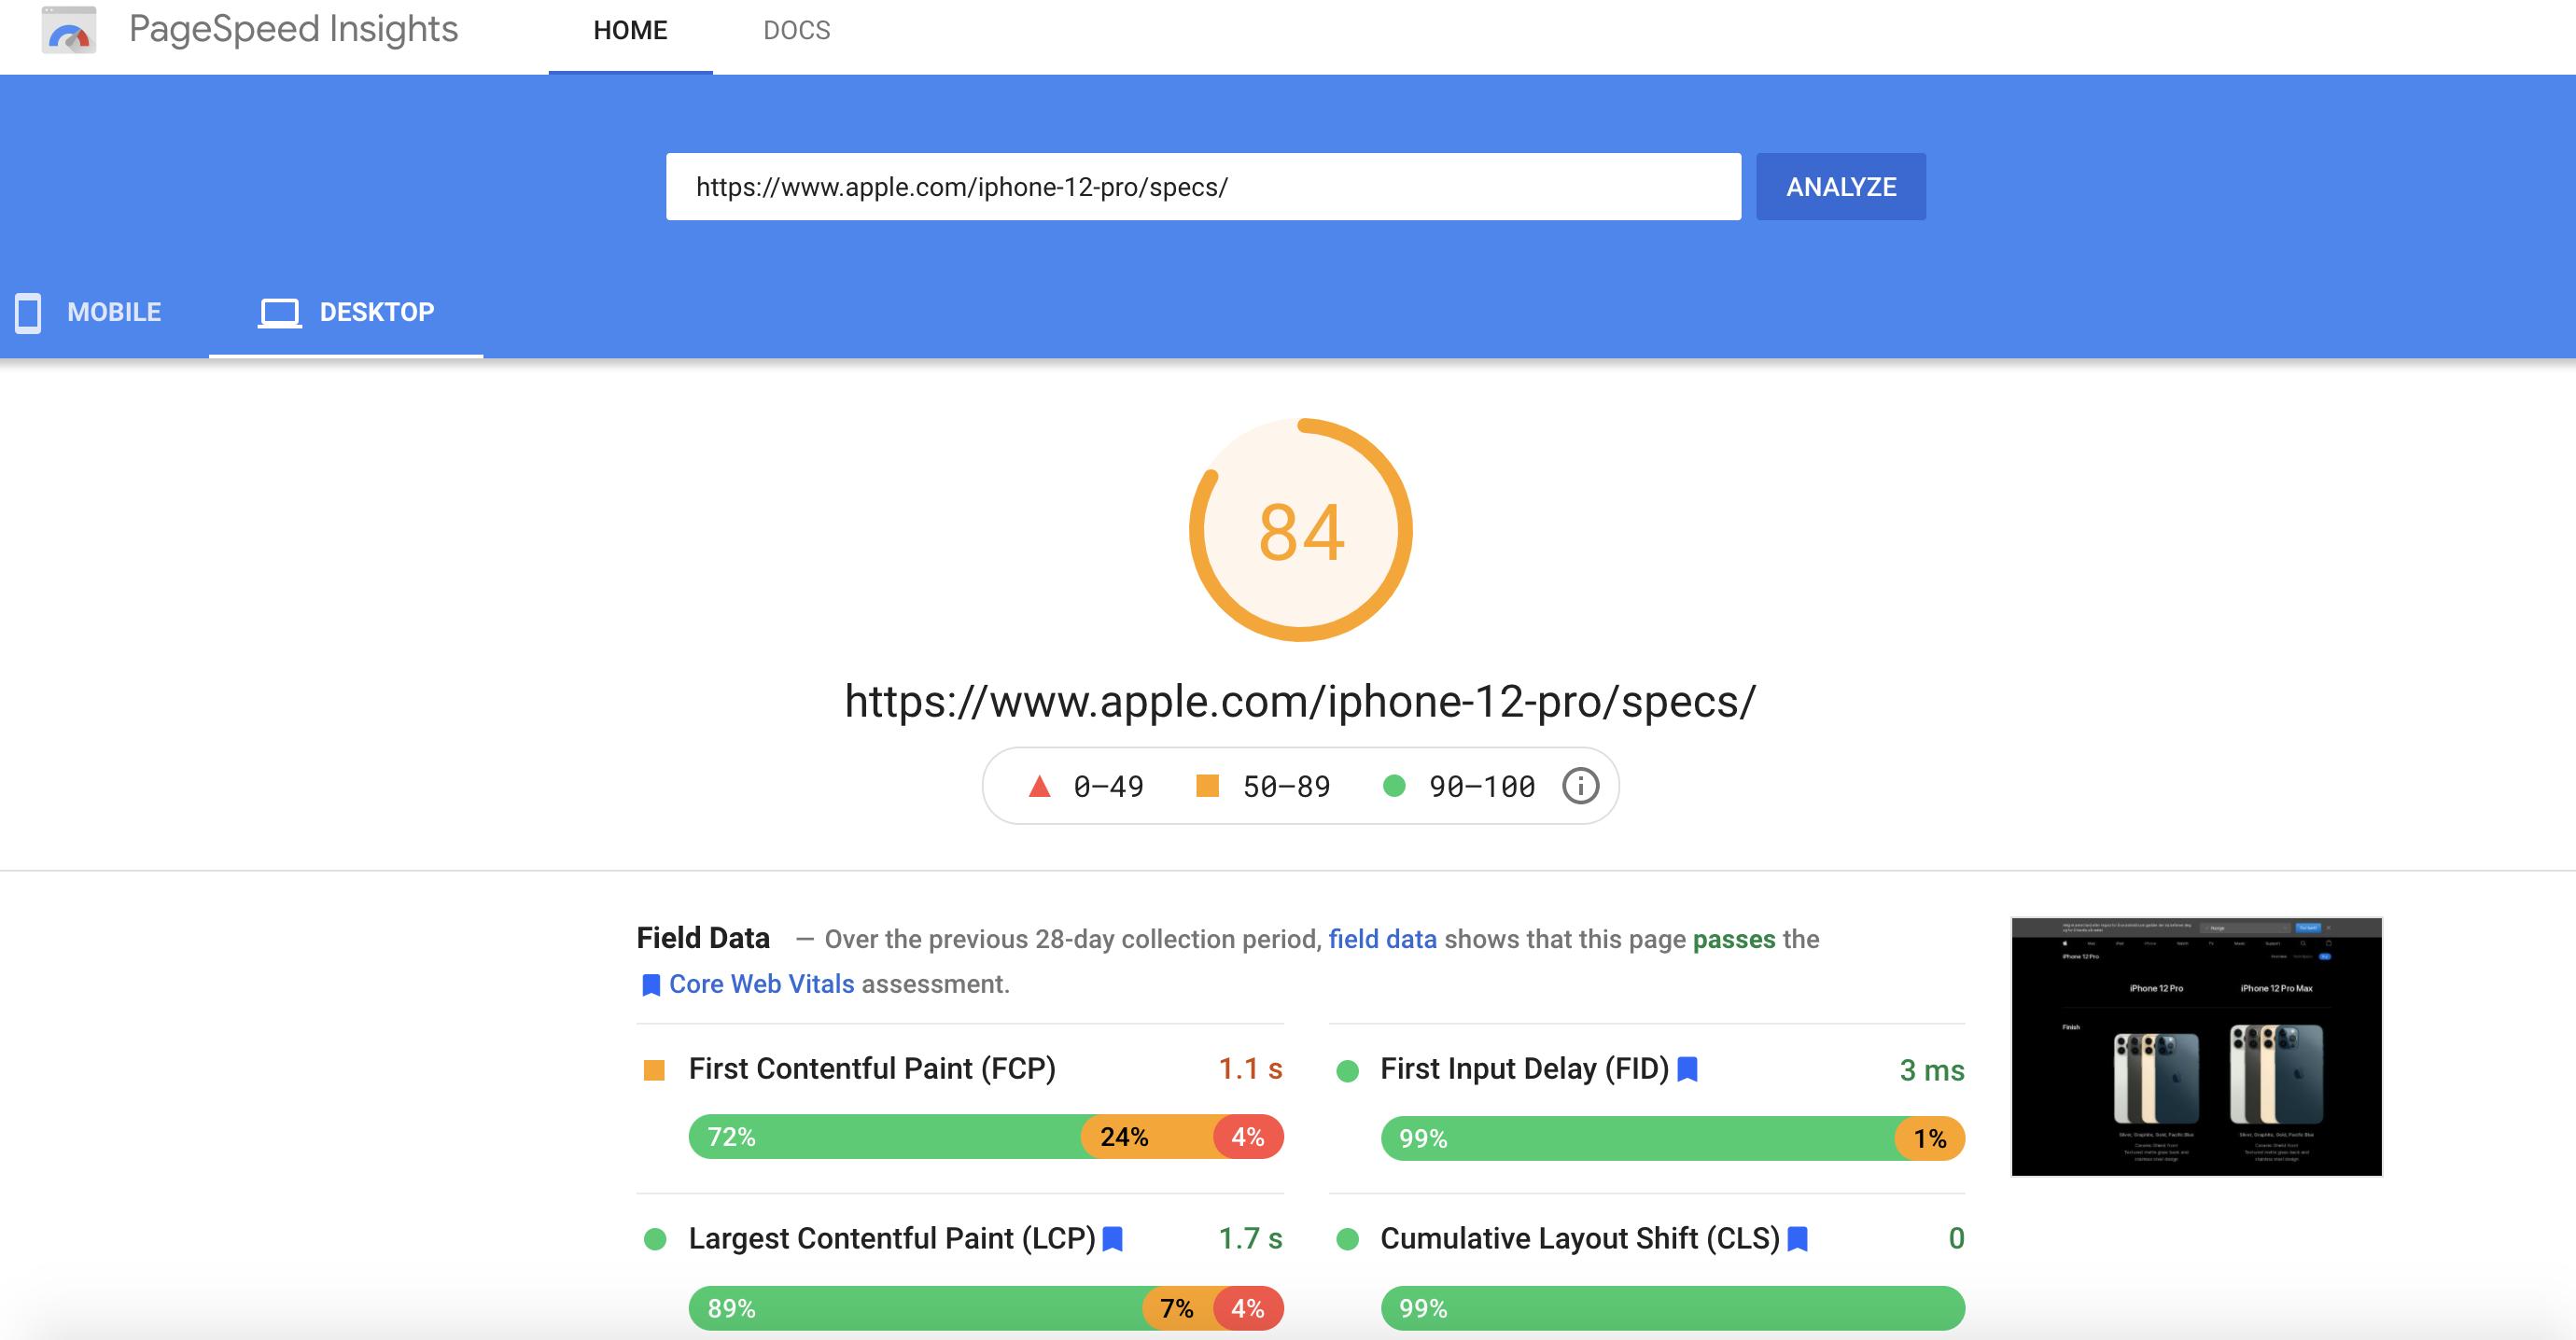 pagespeed insights página web de apple iphone 12 pro